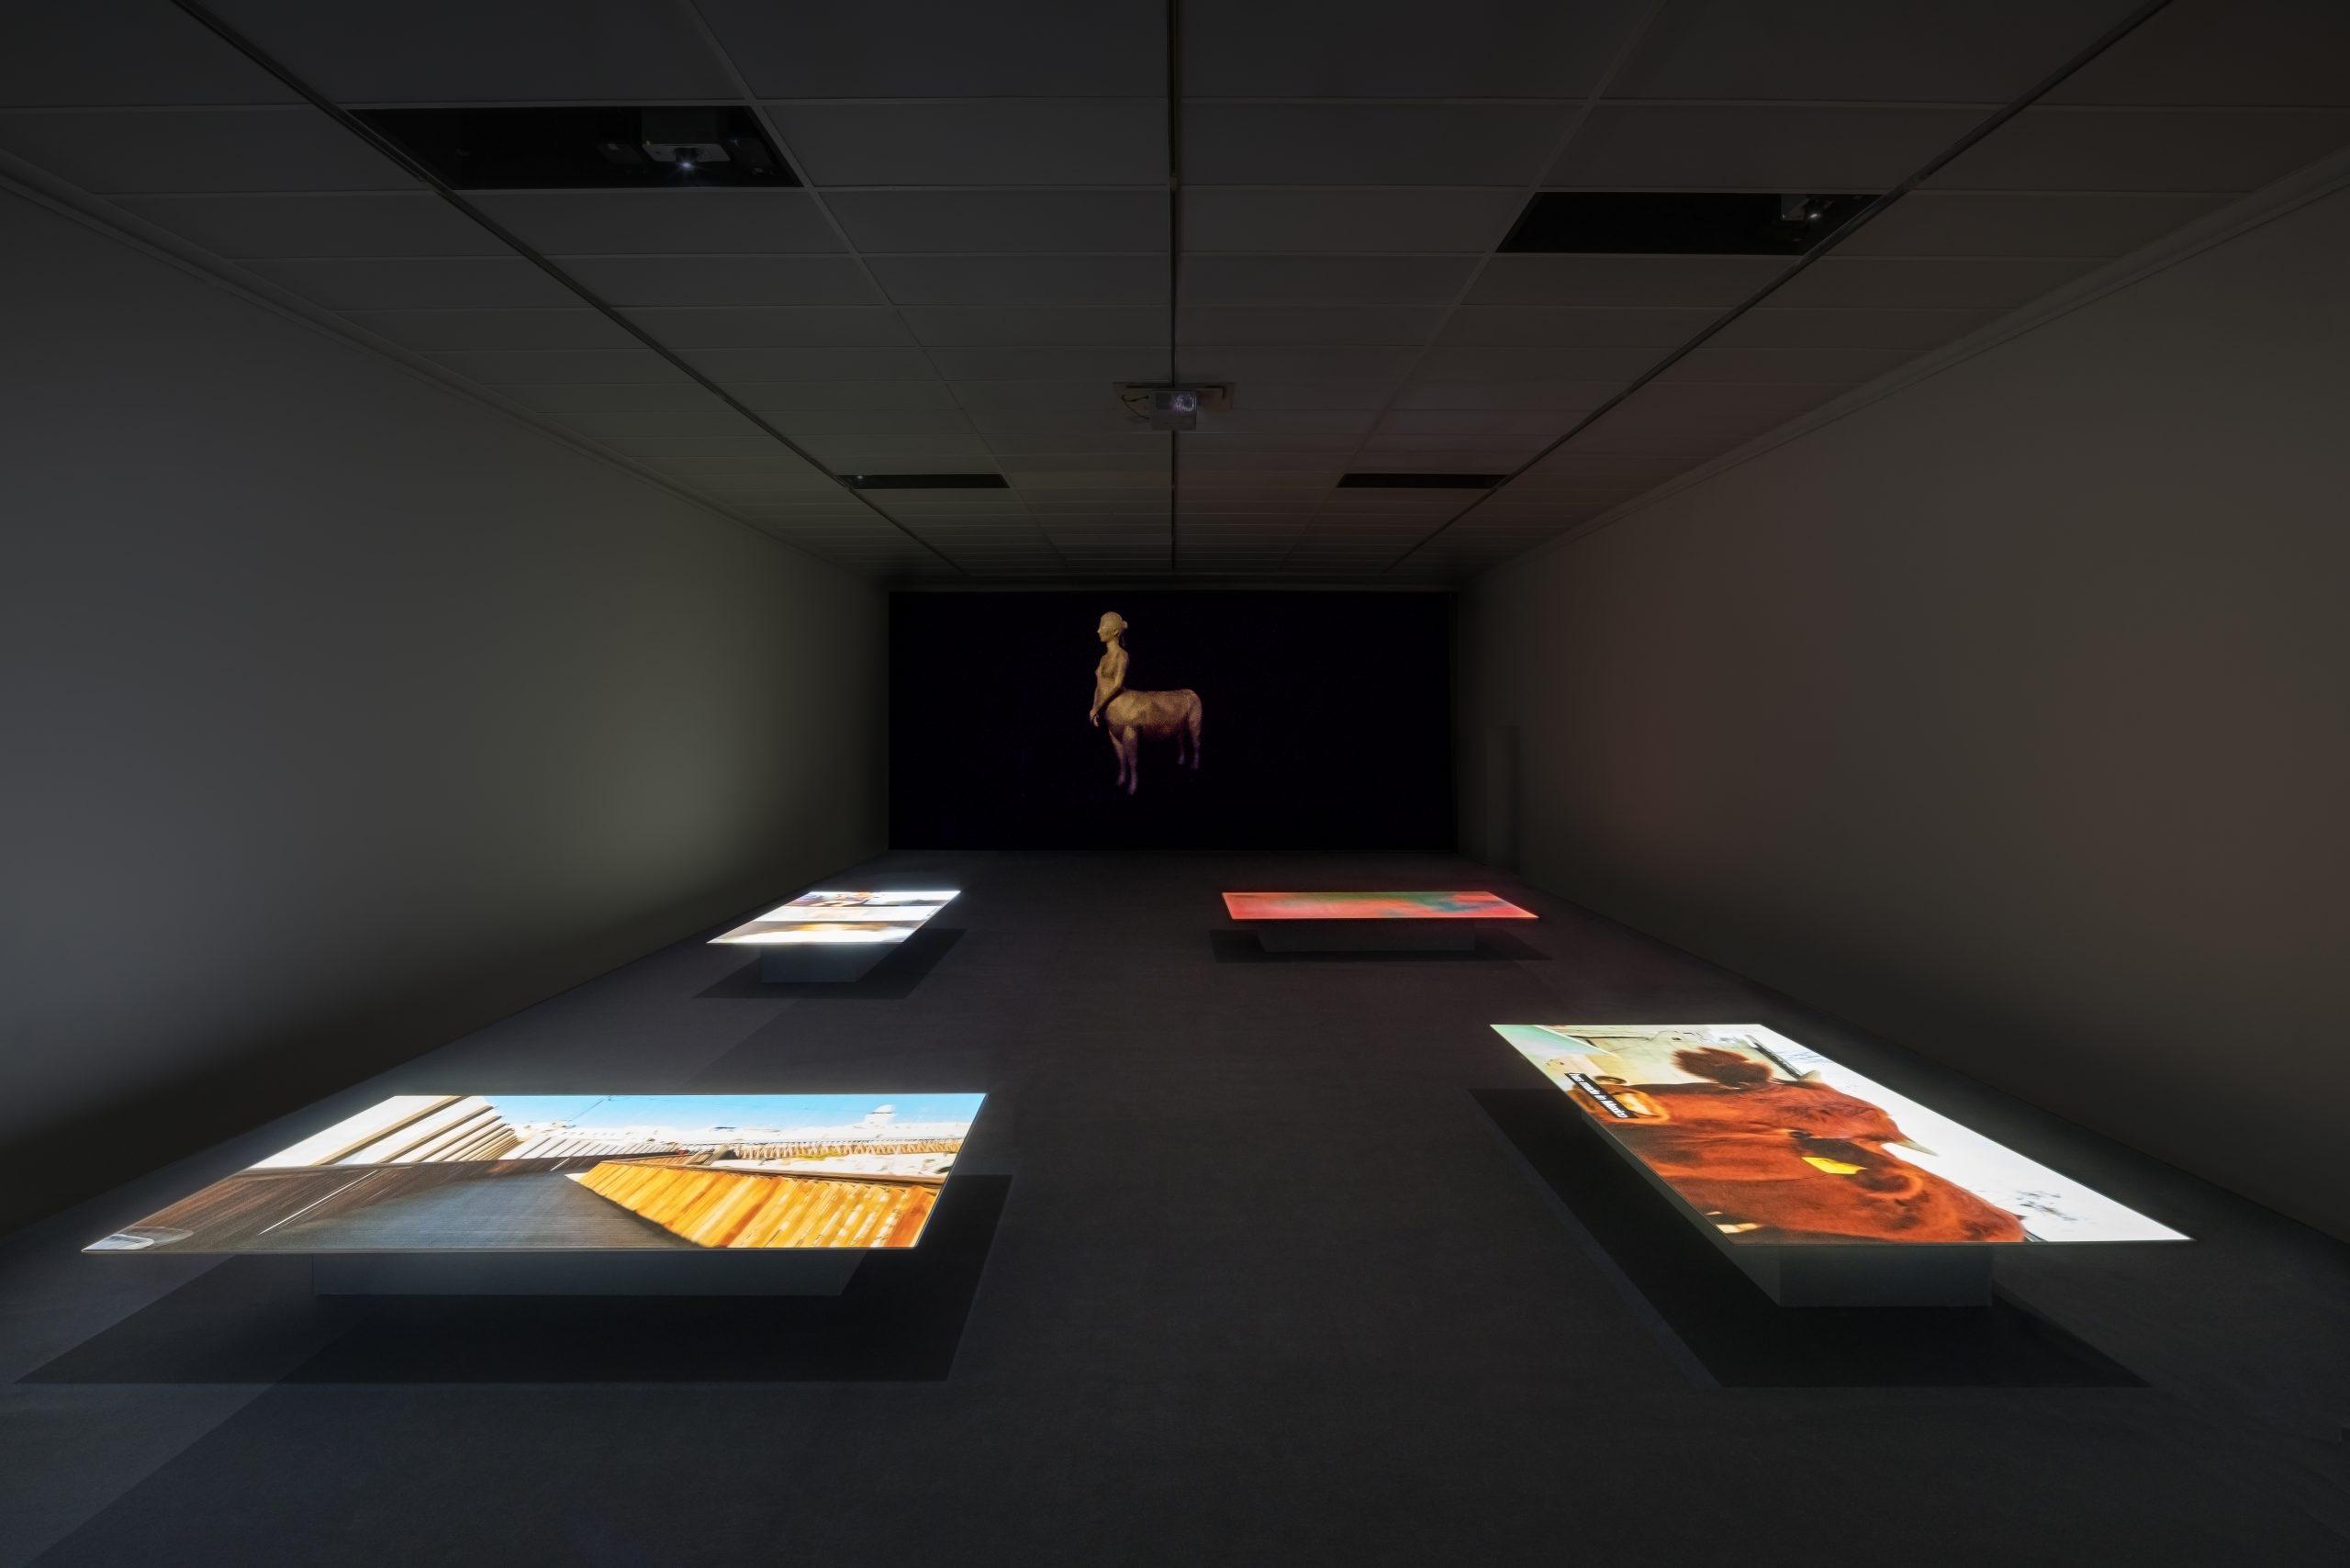 Nira Pereg, Installation view at Kunsthalle Darmstadt, 2017